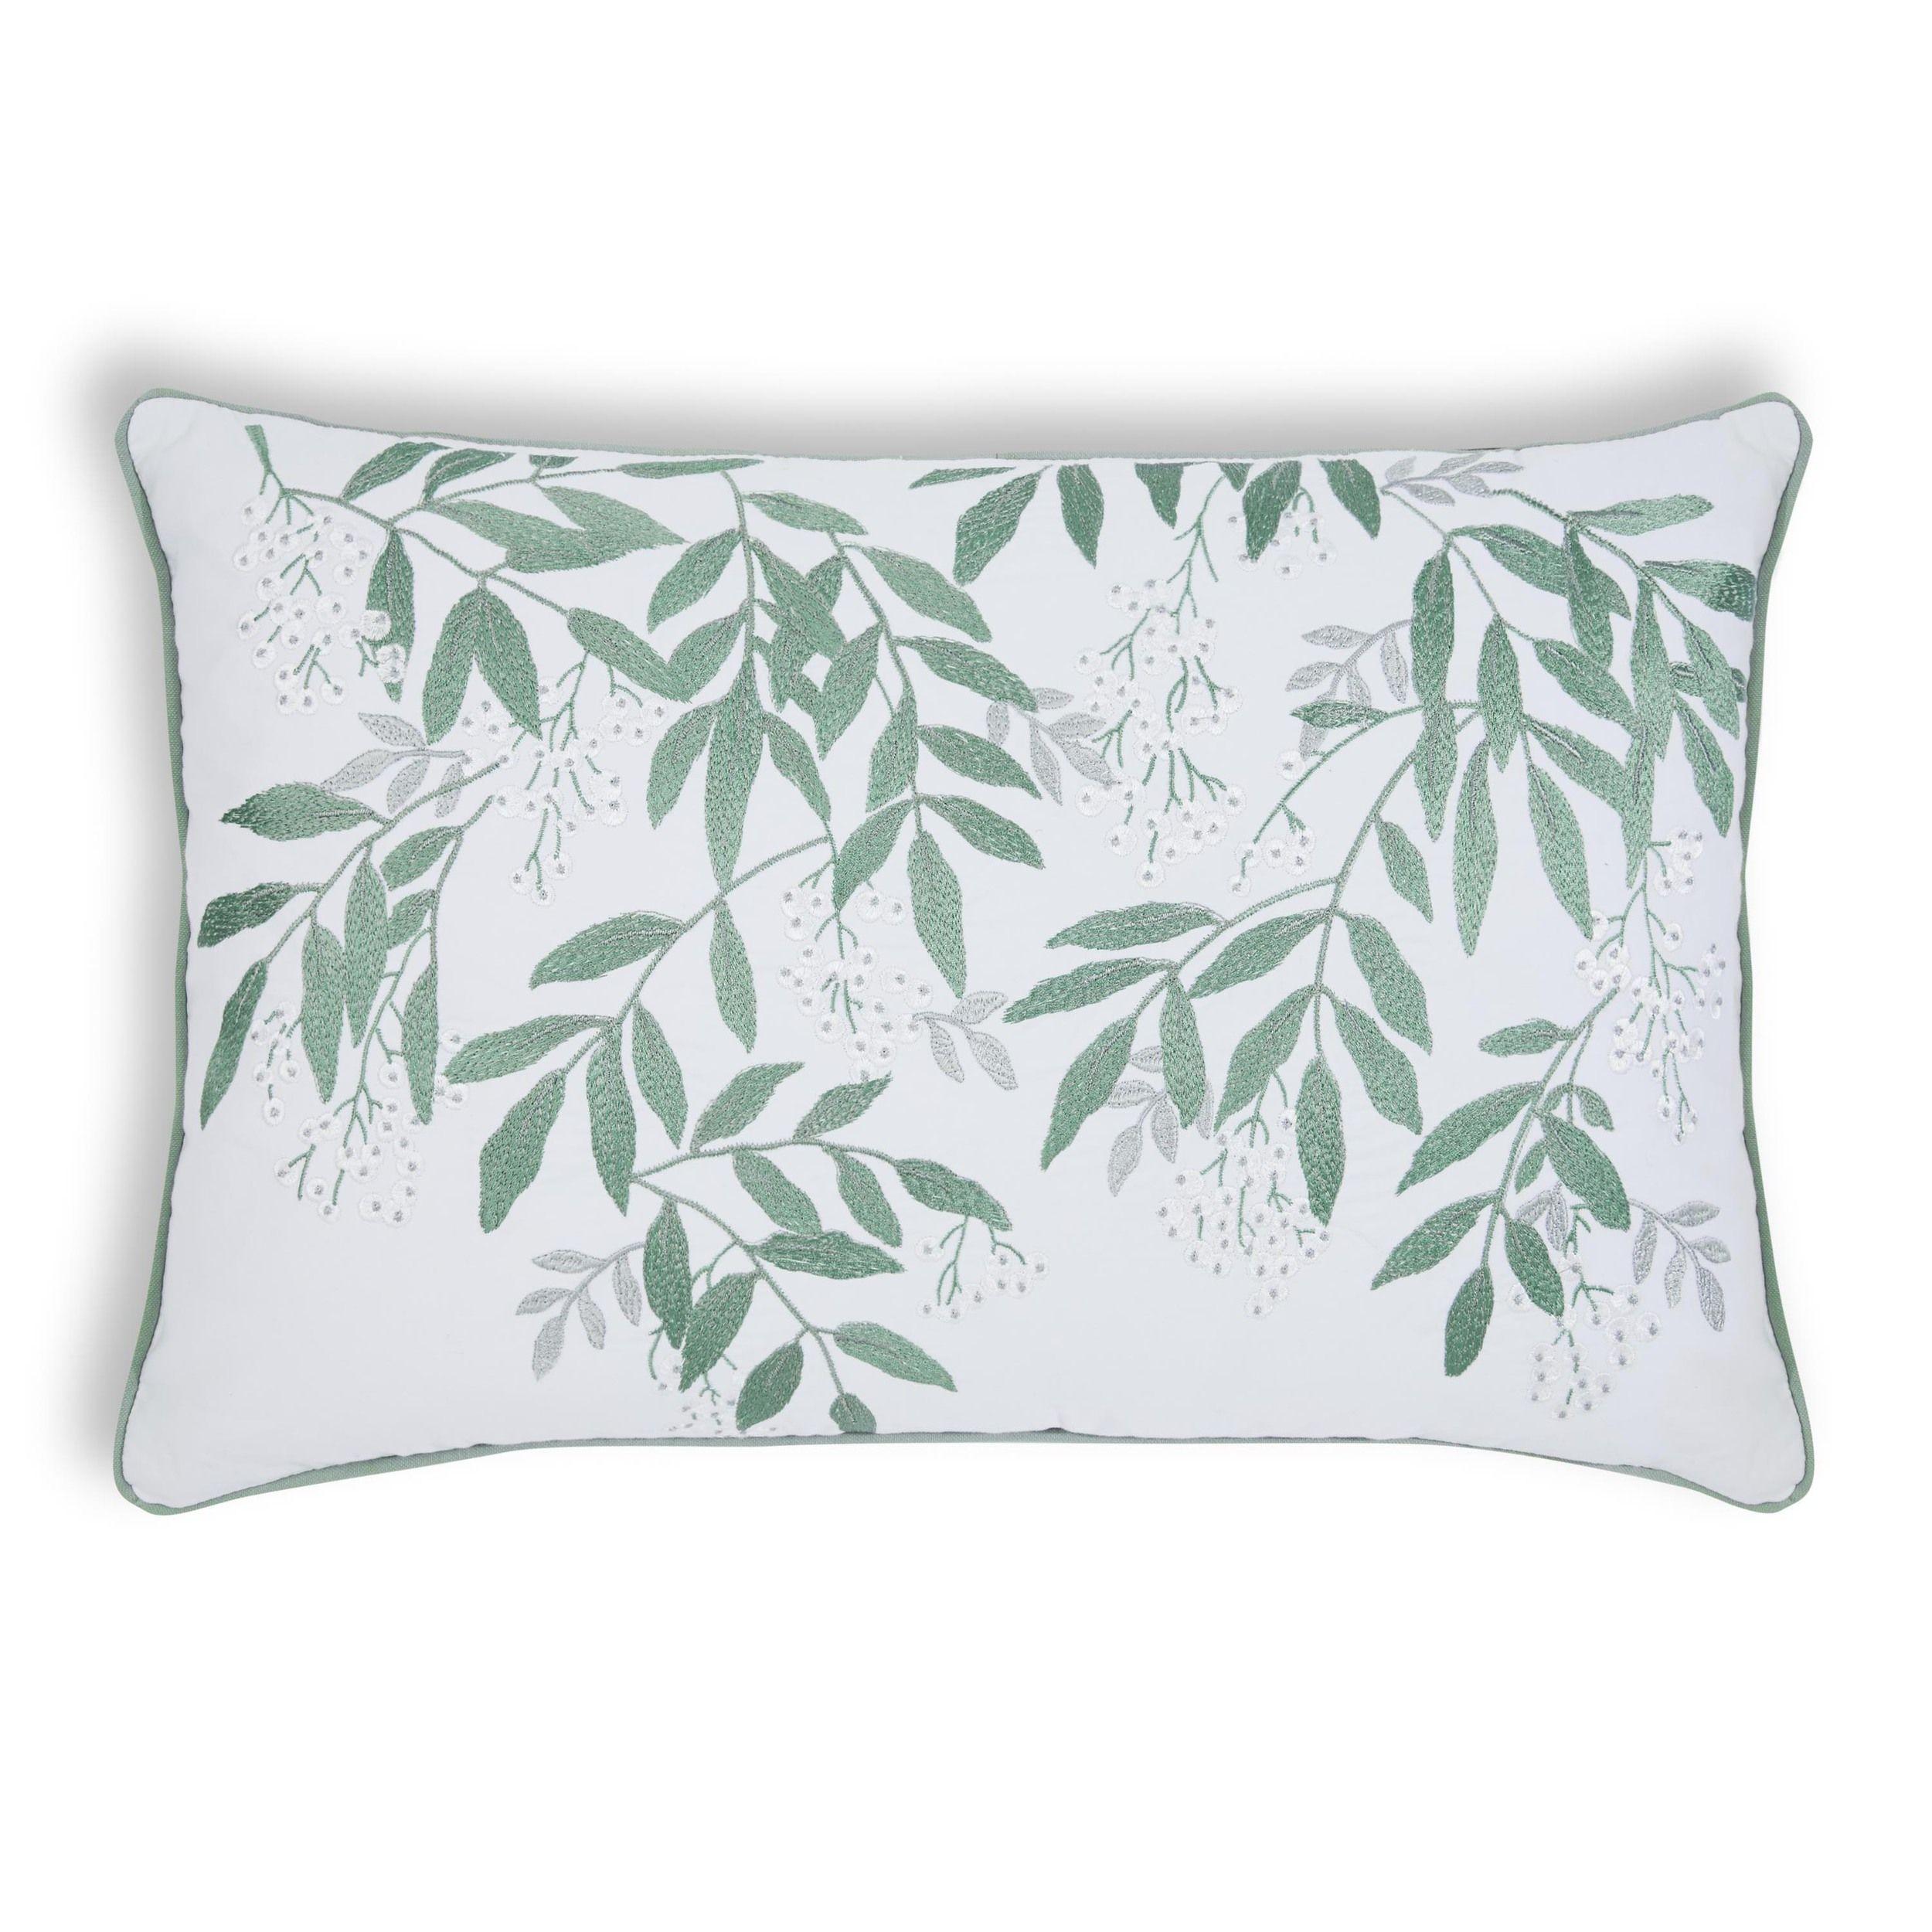 Greendale Embroidered GreyGreen Cushion Laura Ashley Interiors